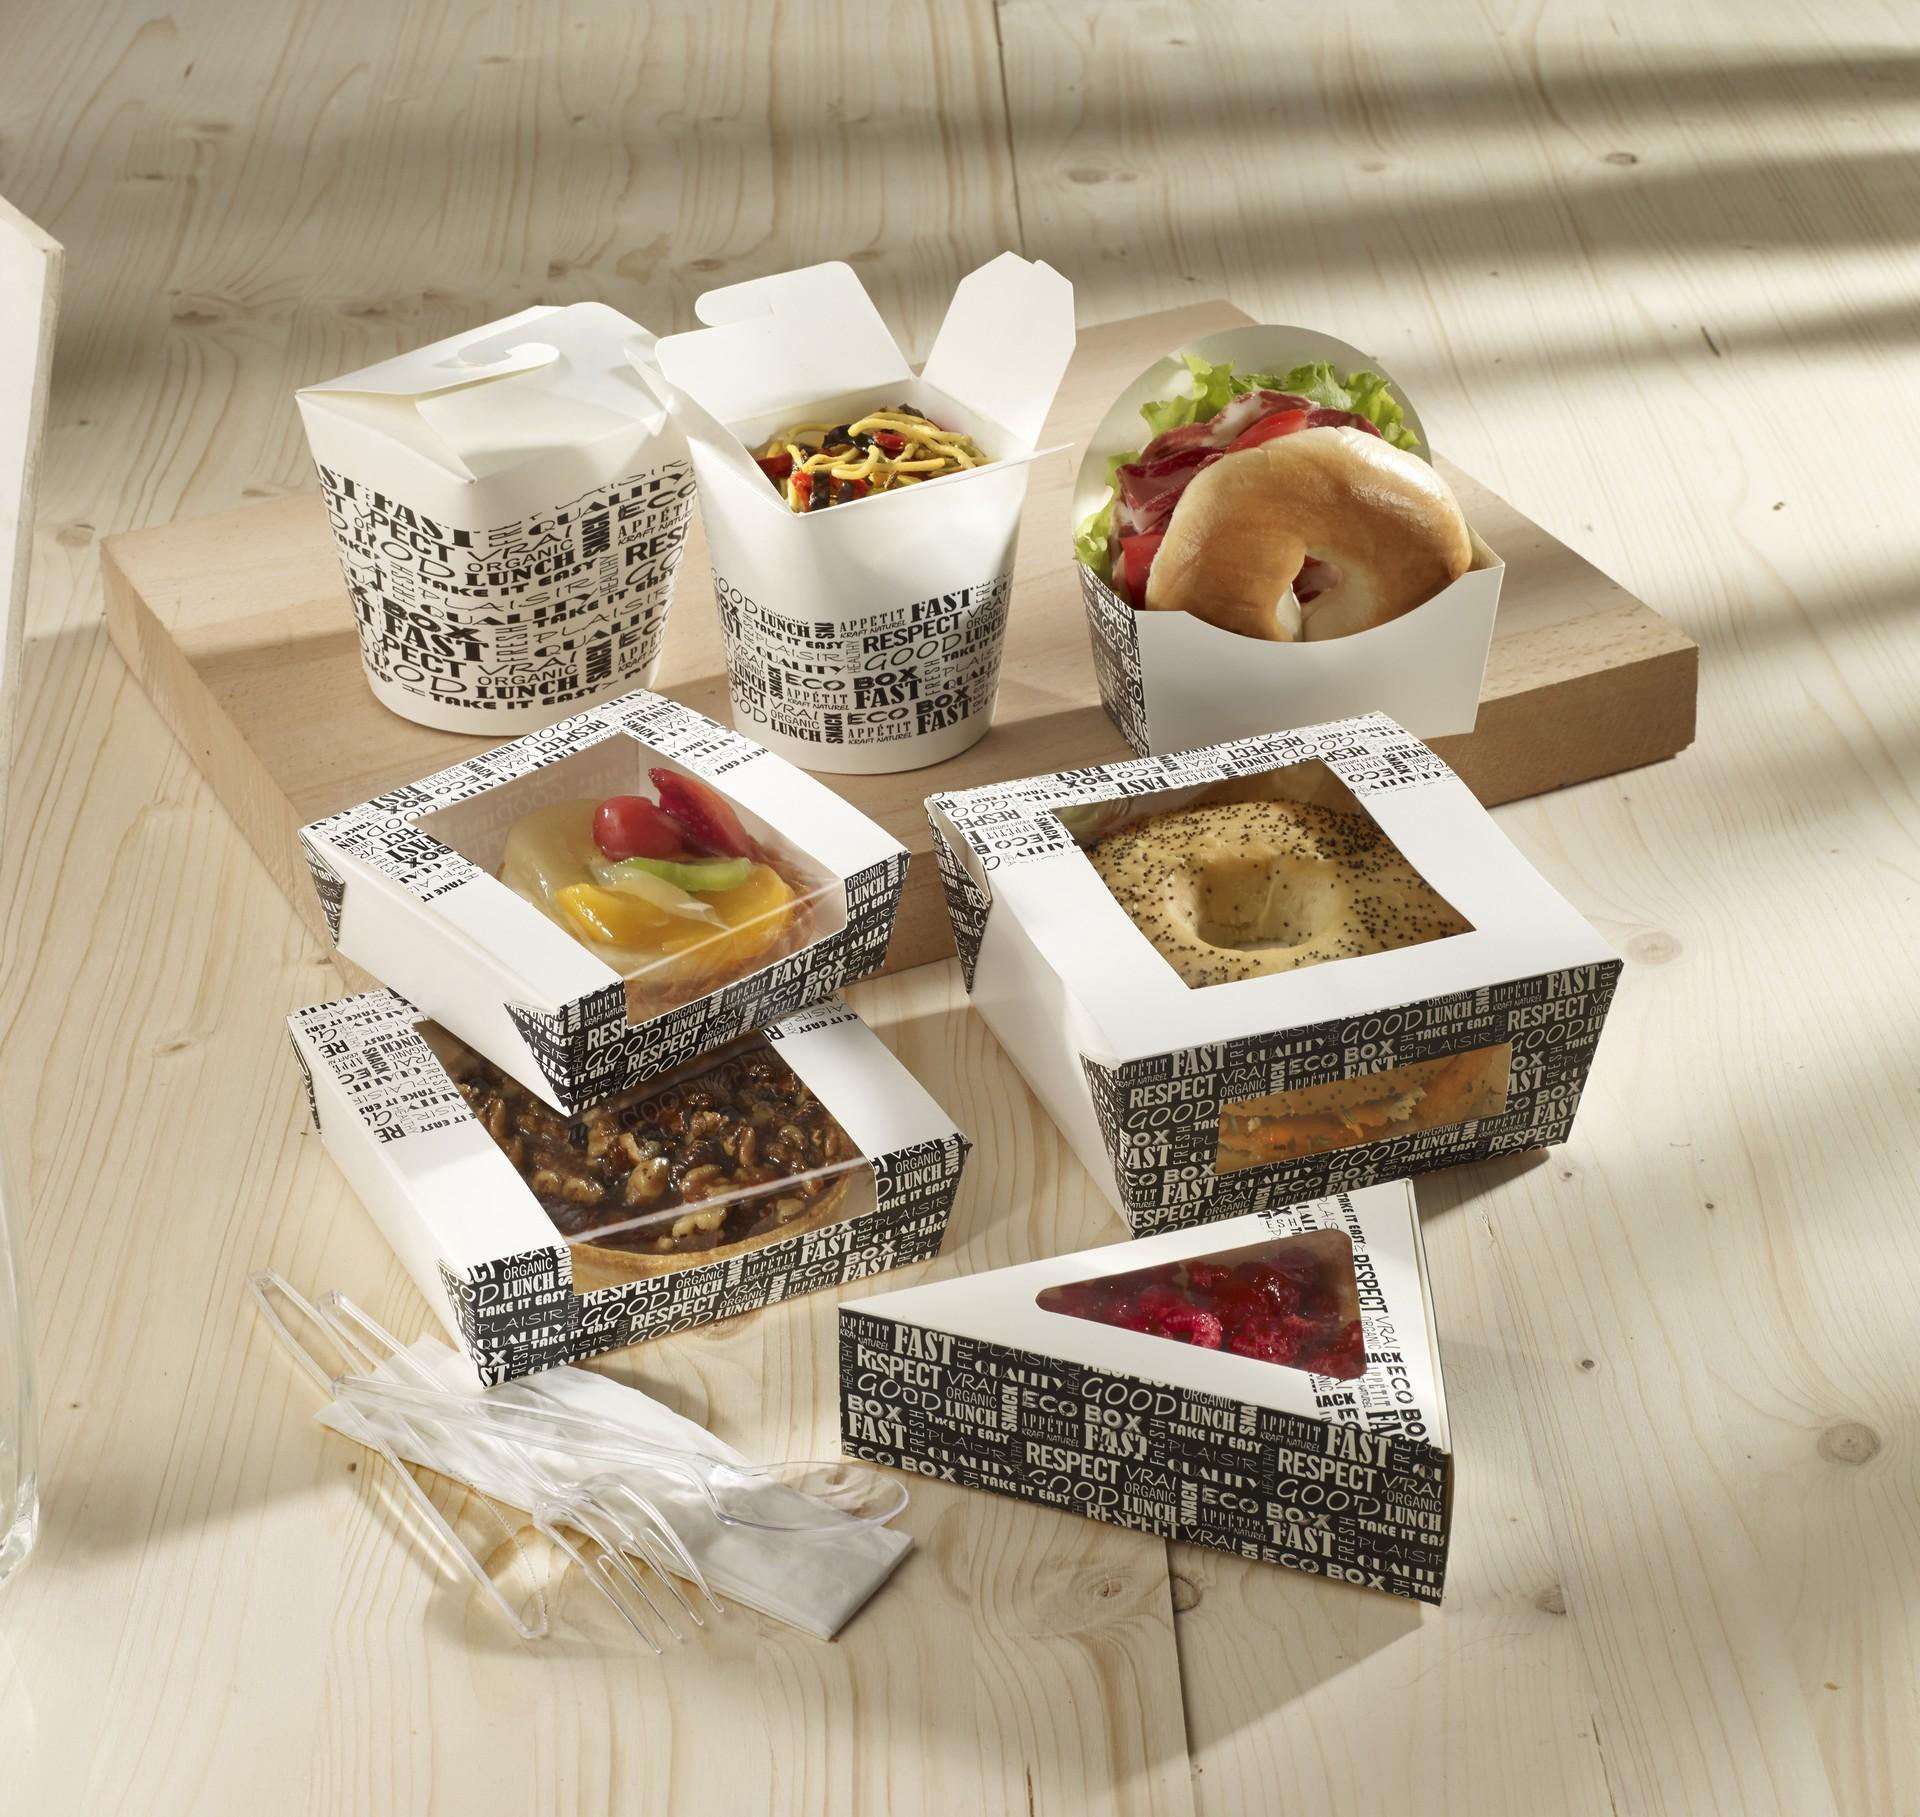 Emballages restauration rapide